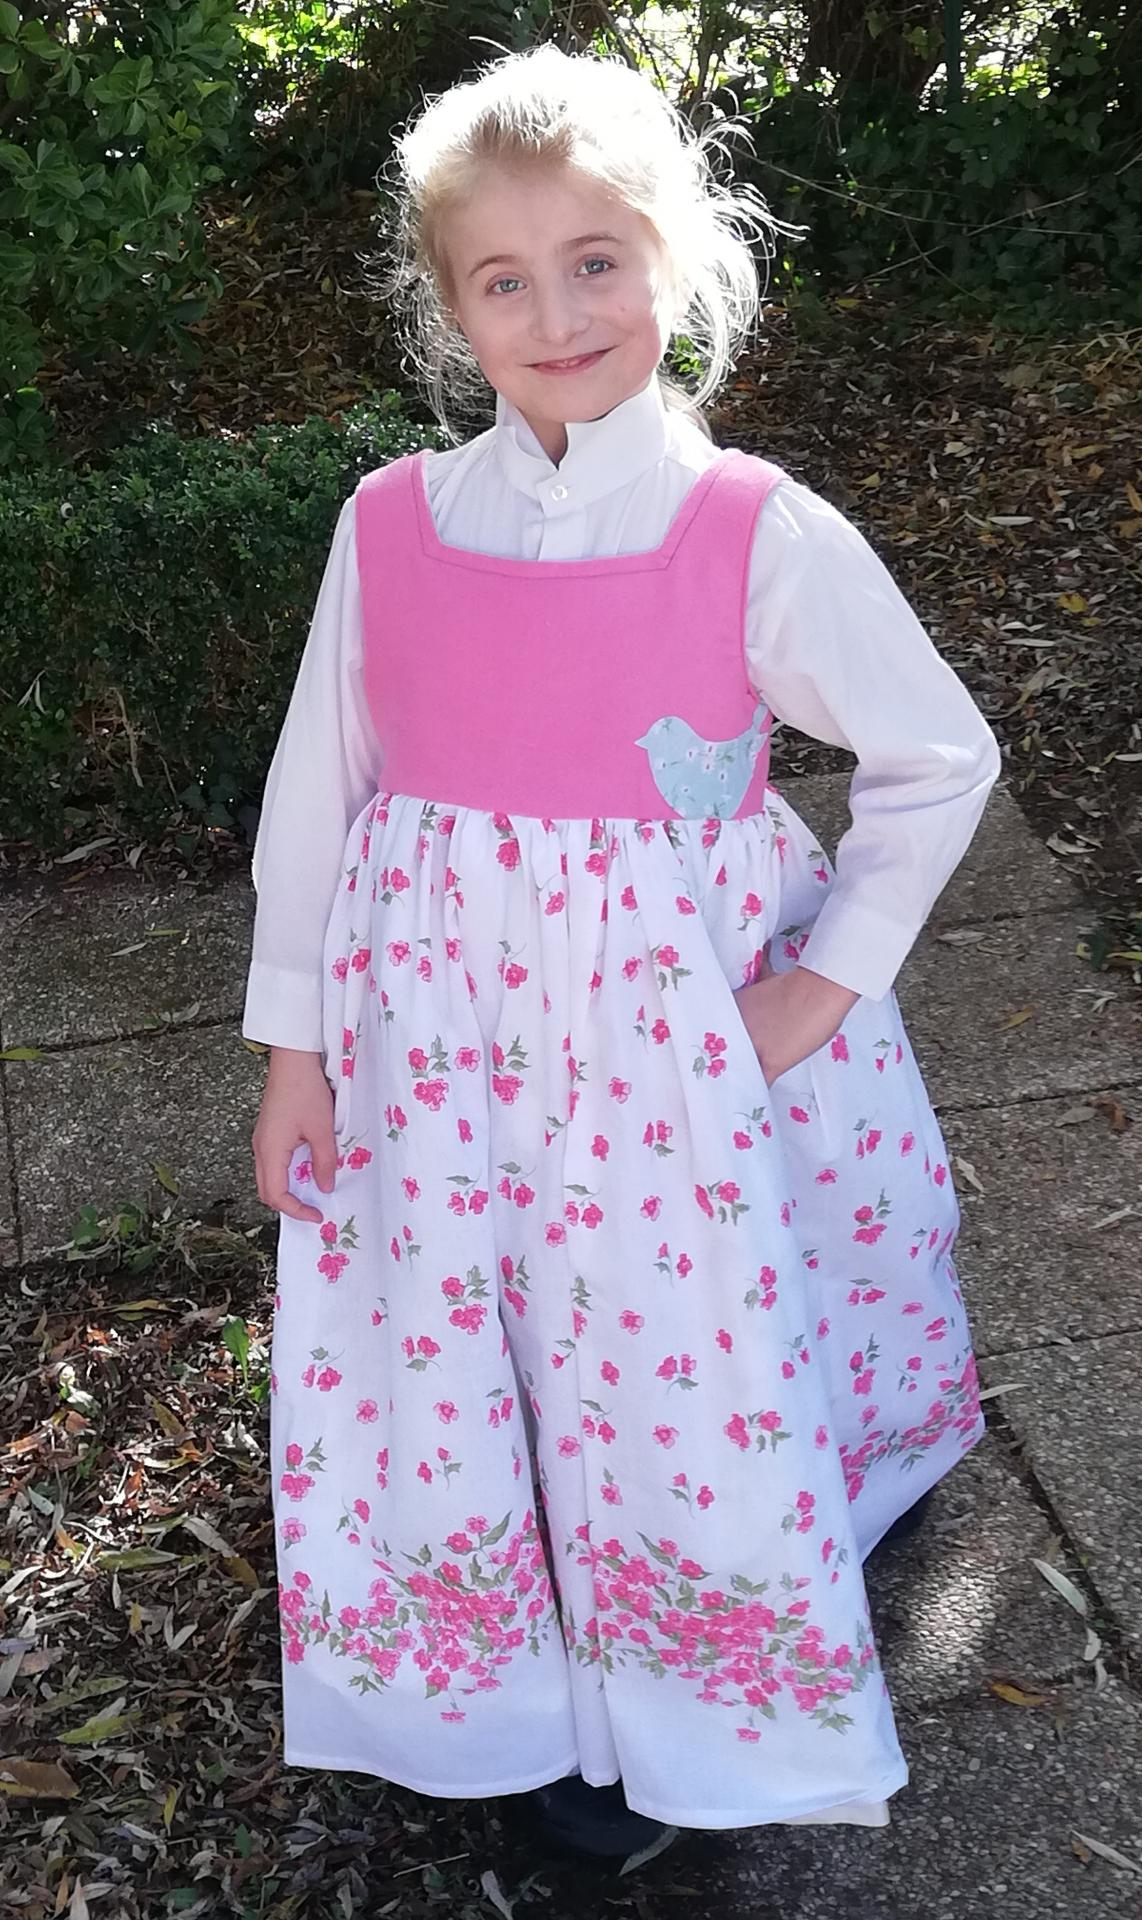 Robe de princesse reversible 7 8 ans fraise fifi au jardin pose 4